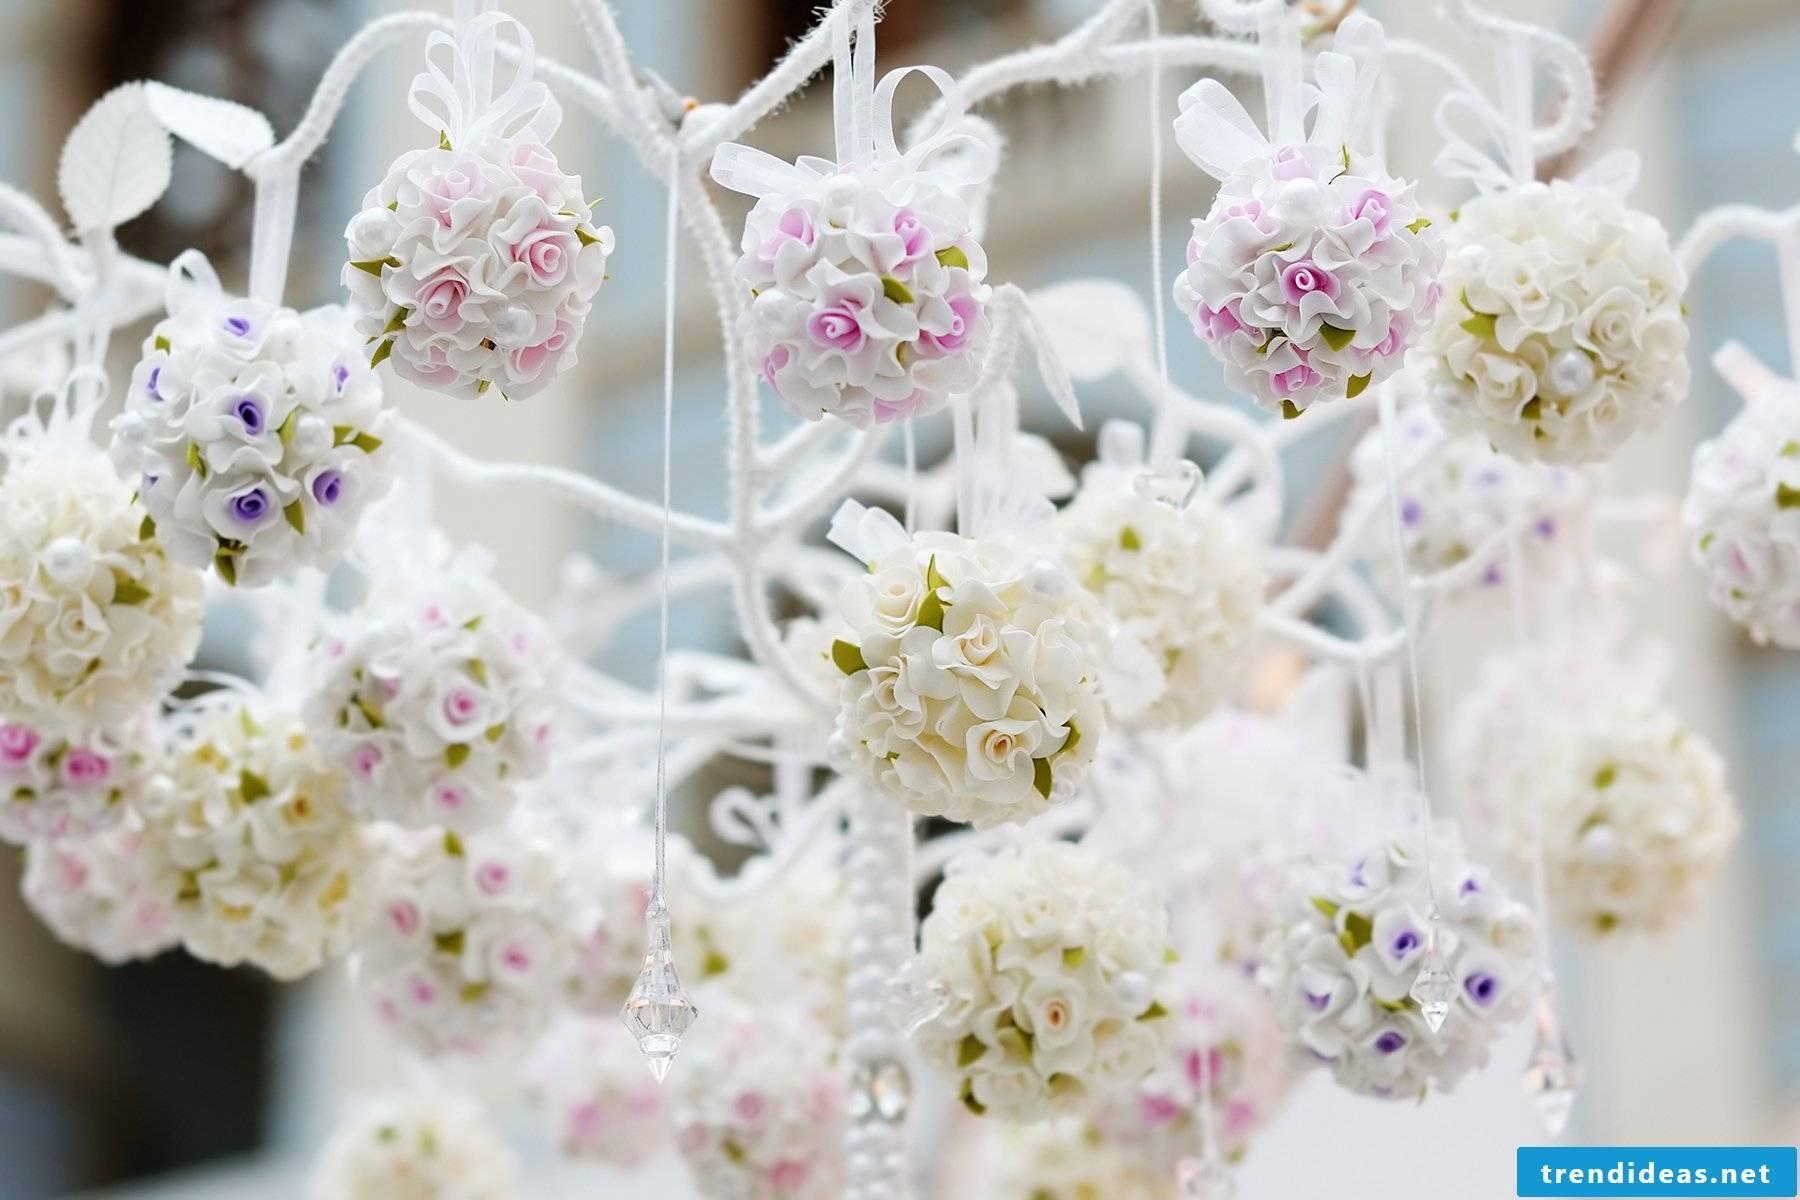 floral deco wedding ideas floral arrangements wedding wedding flowers